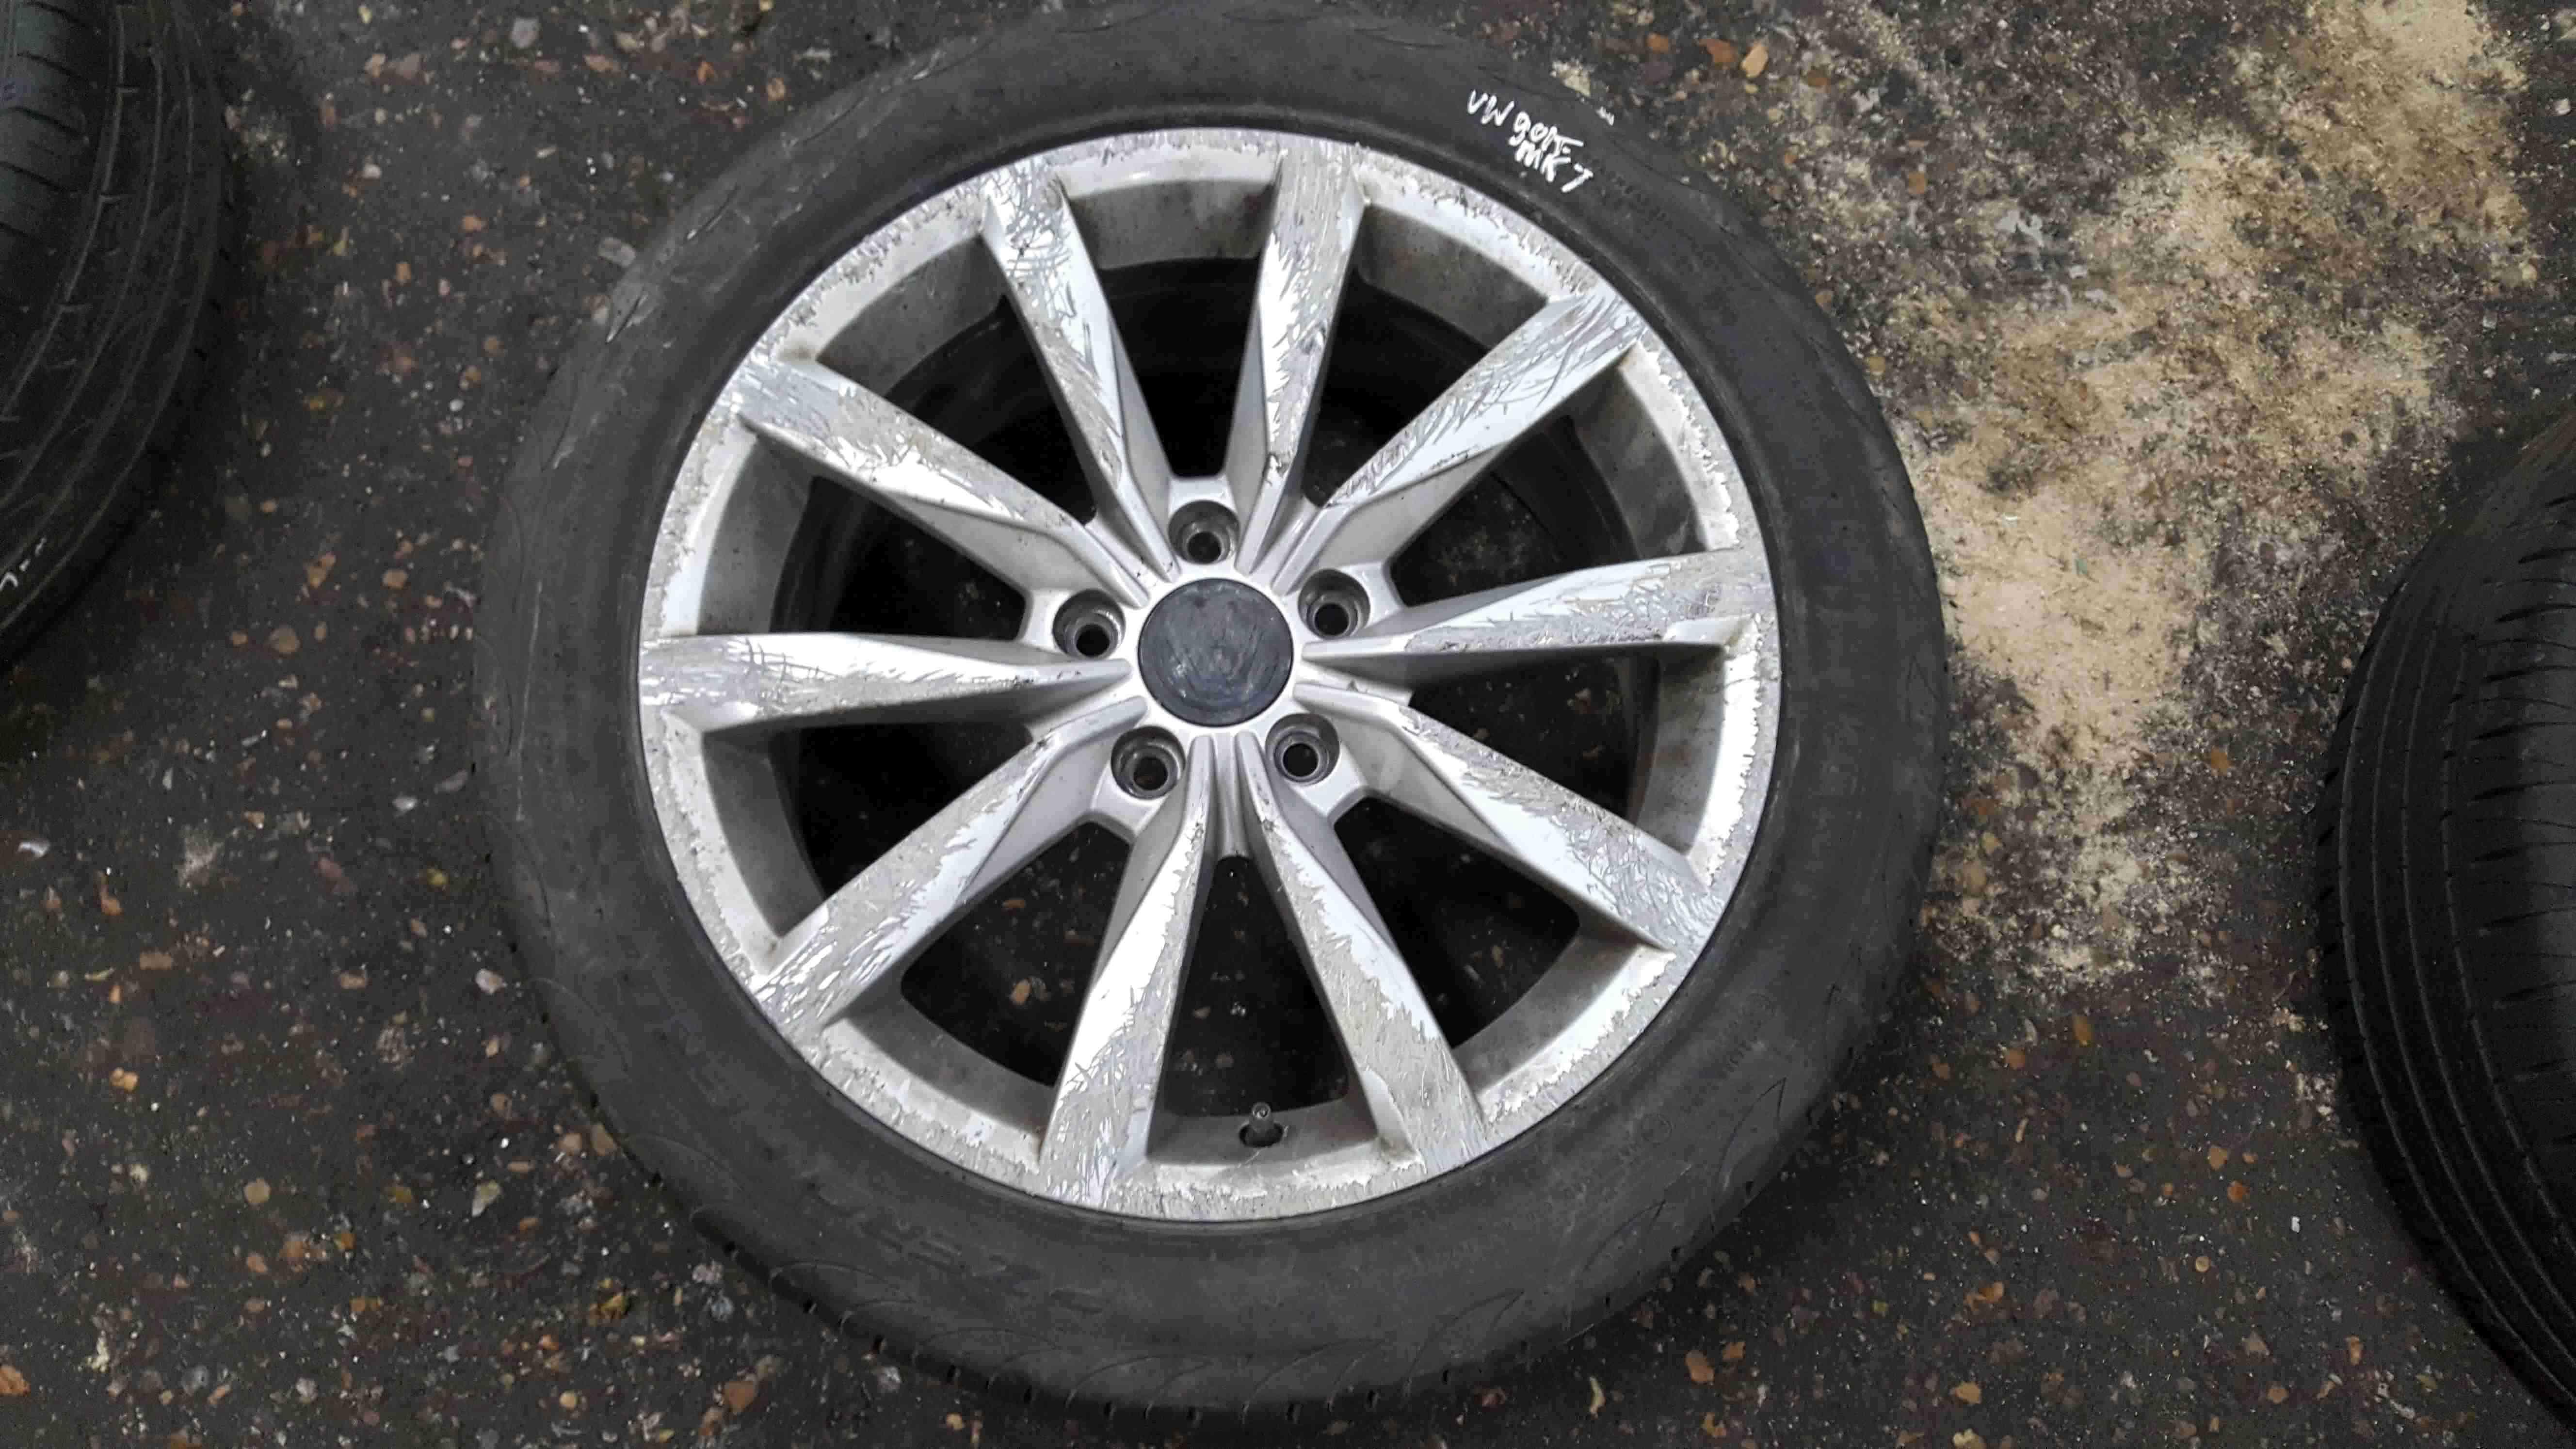 Volkswagen Golf MK7 2012-2017 Dijon Alloy Wheel 17inch Rim 5G0601025CH